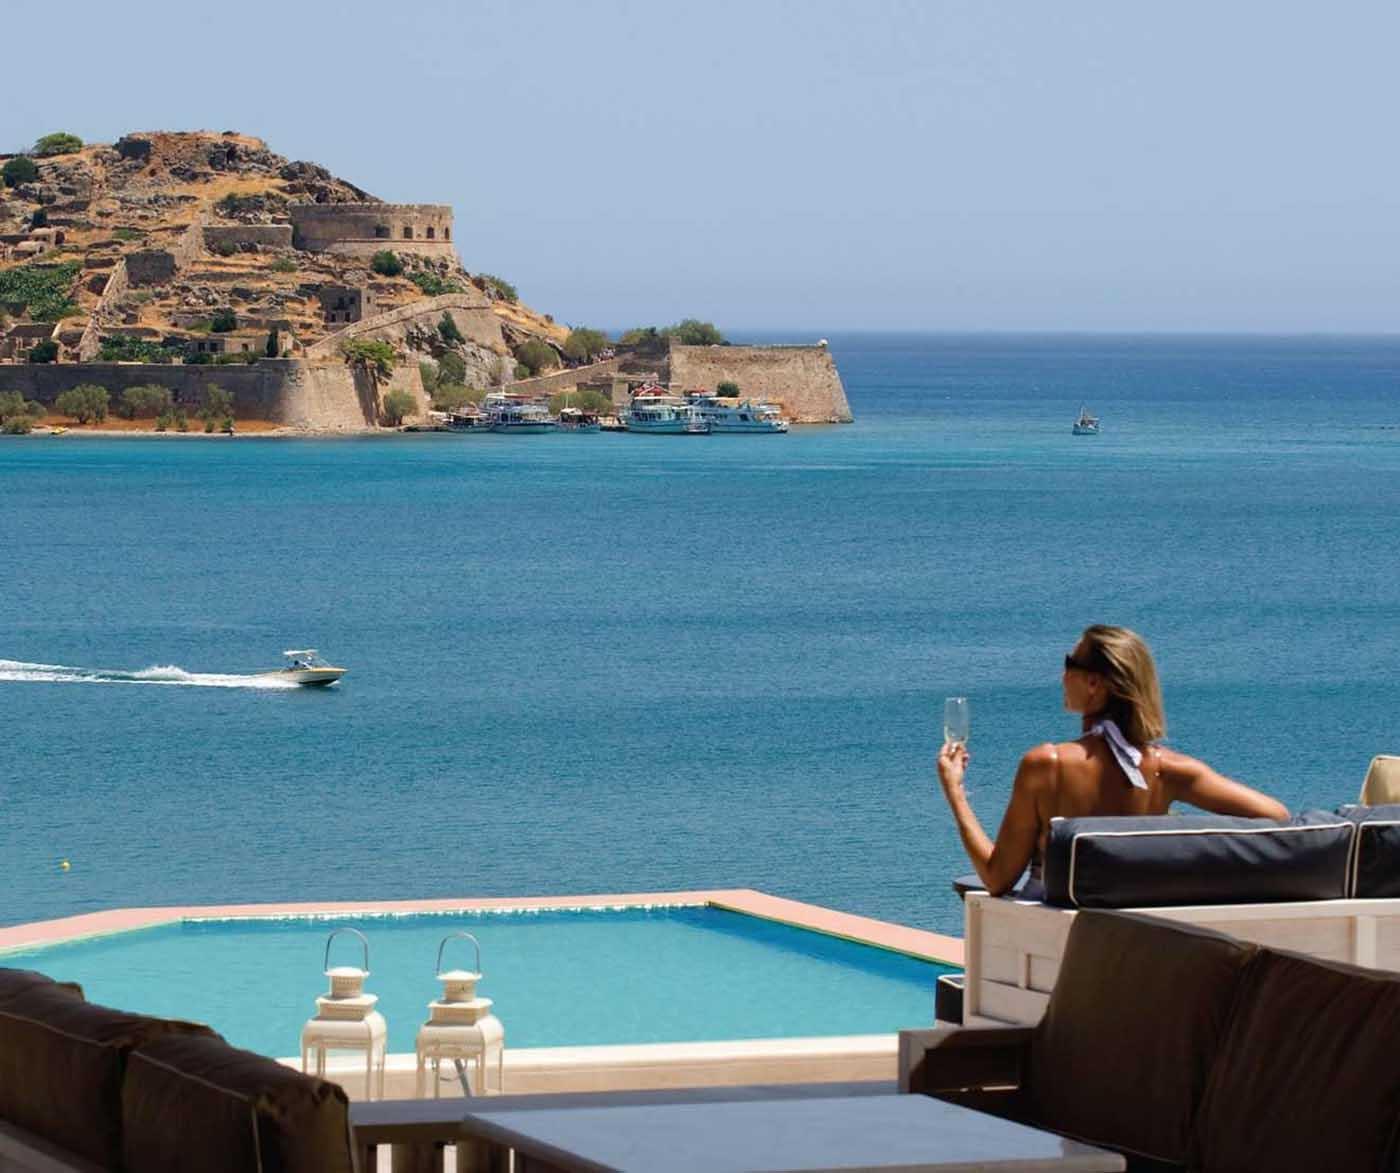 Elounda hotels & resorts, 50% discount for early bookings, Elounda, Lassithi, Crete, Greece